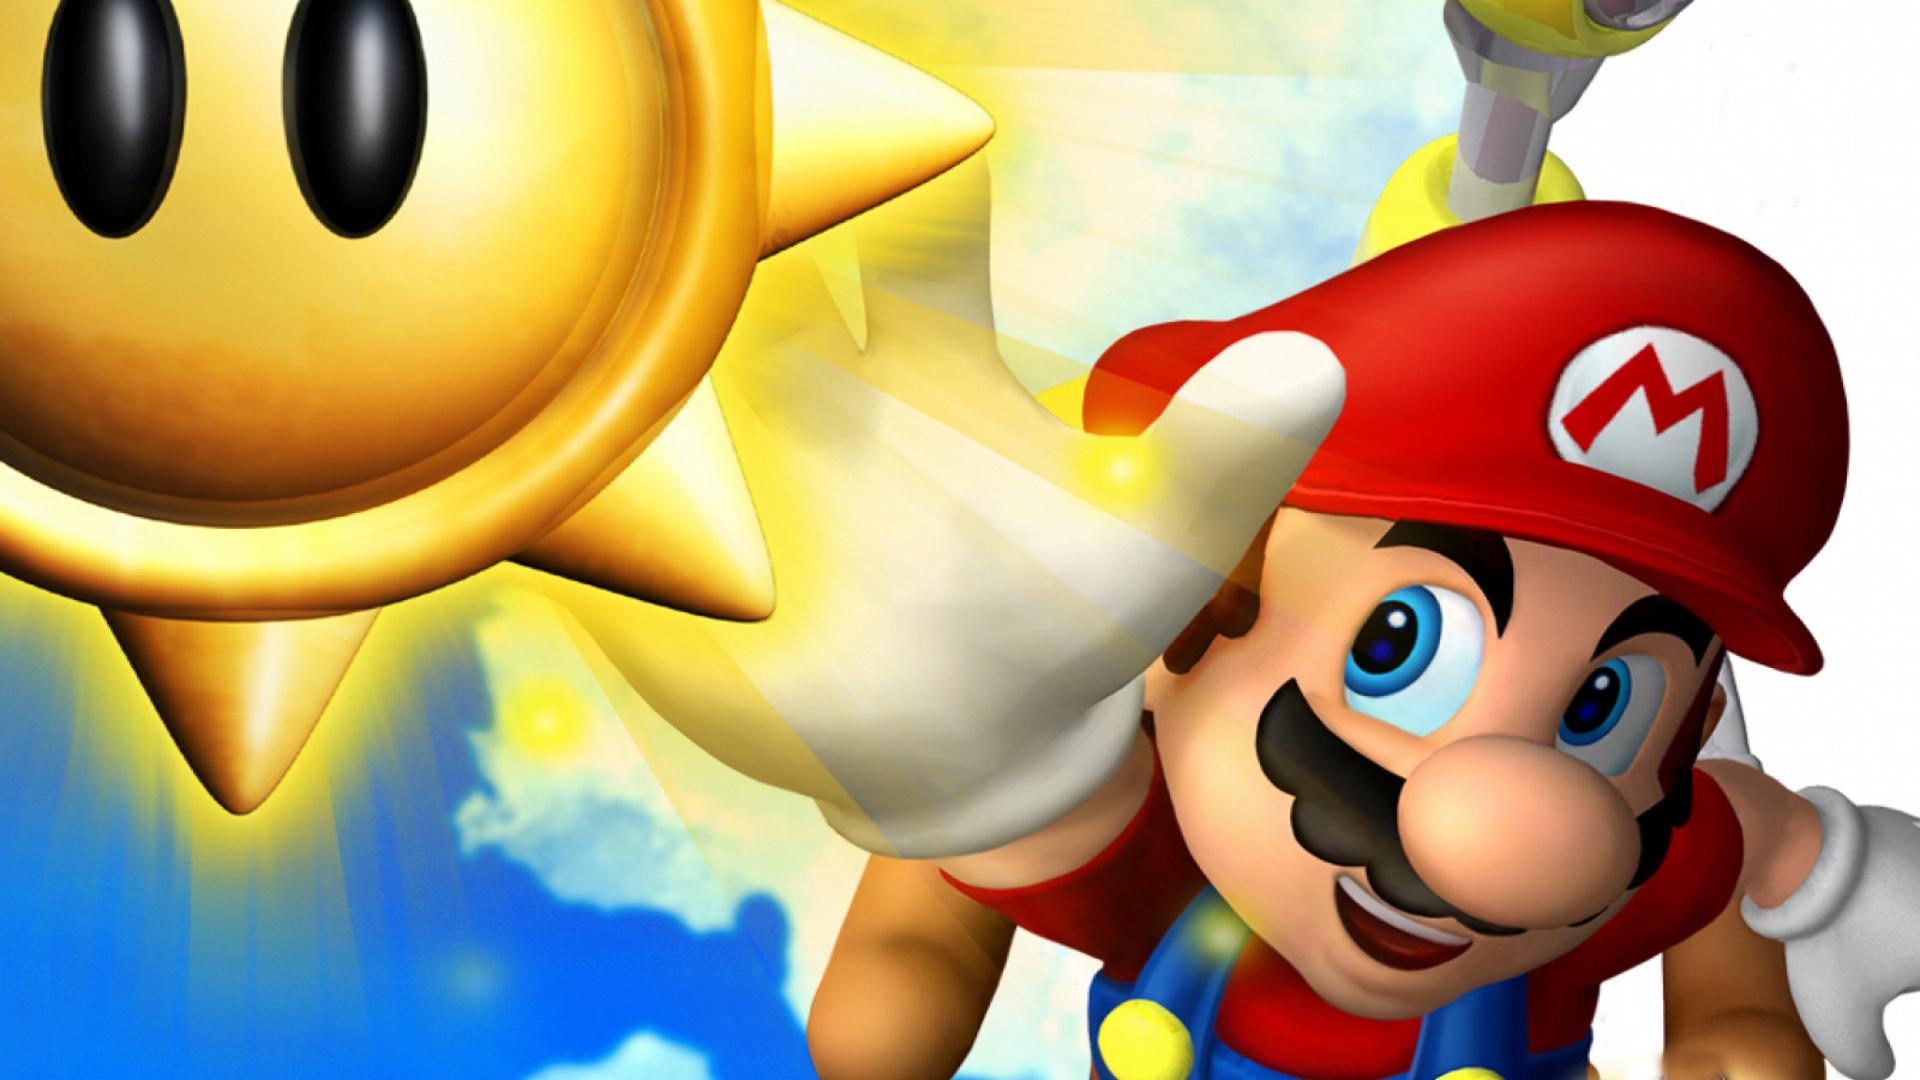 2160x1920 Wallpaper Appsapk 468: Jeux Vidéo Super Mario Sunshine Mario Fond D'écran